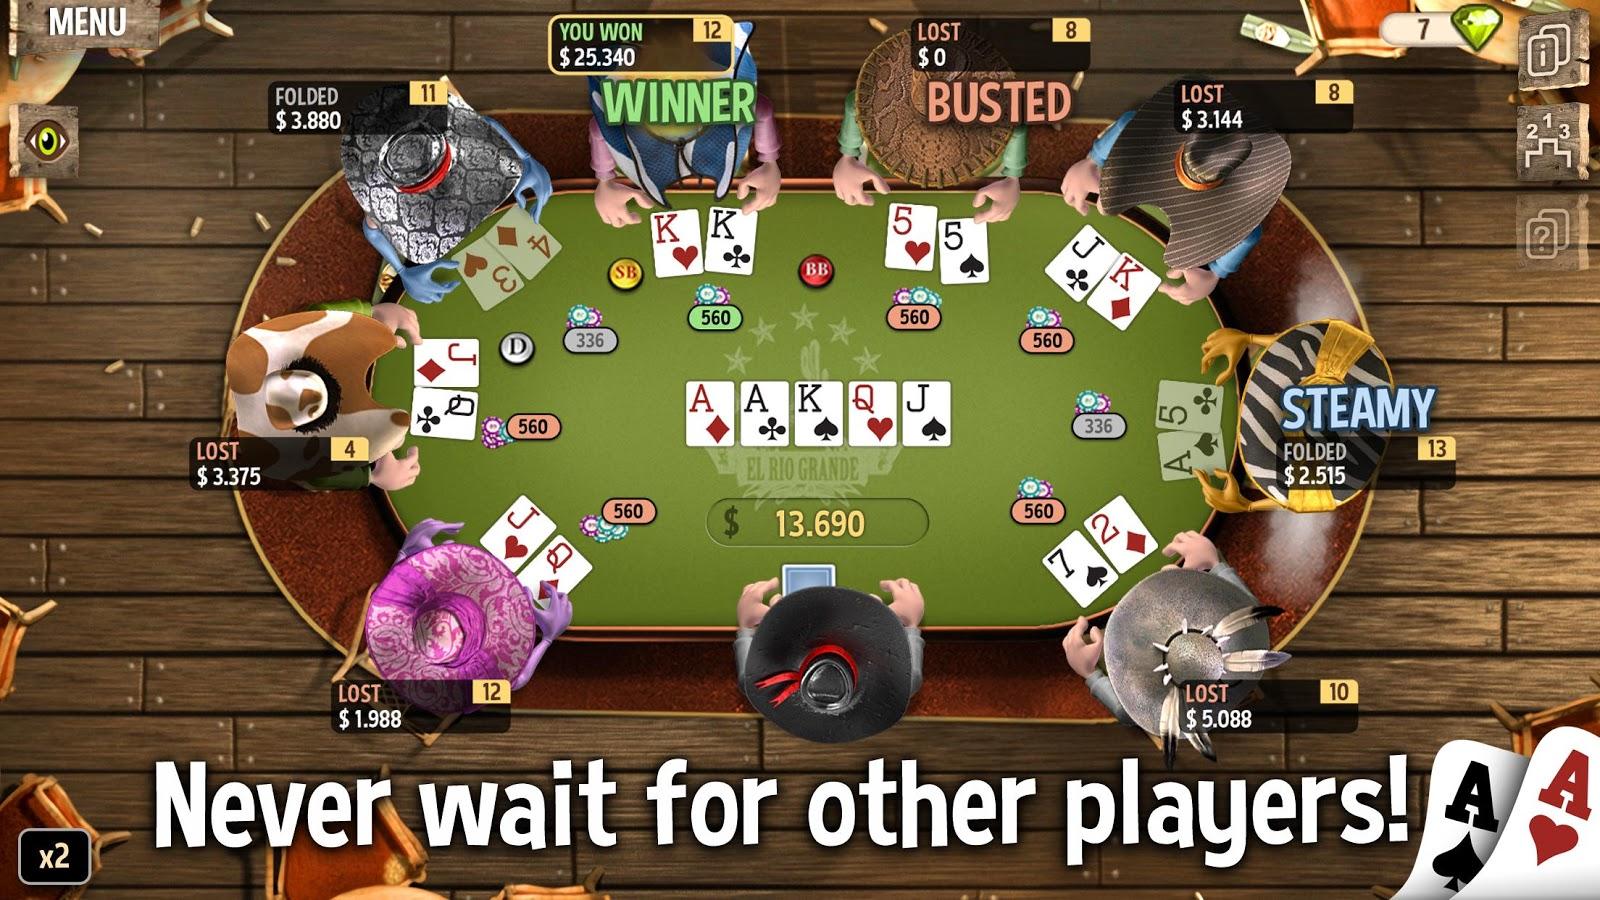 Lincecia de Scasino poker texas online 119314